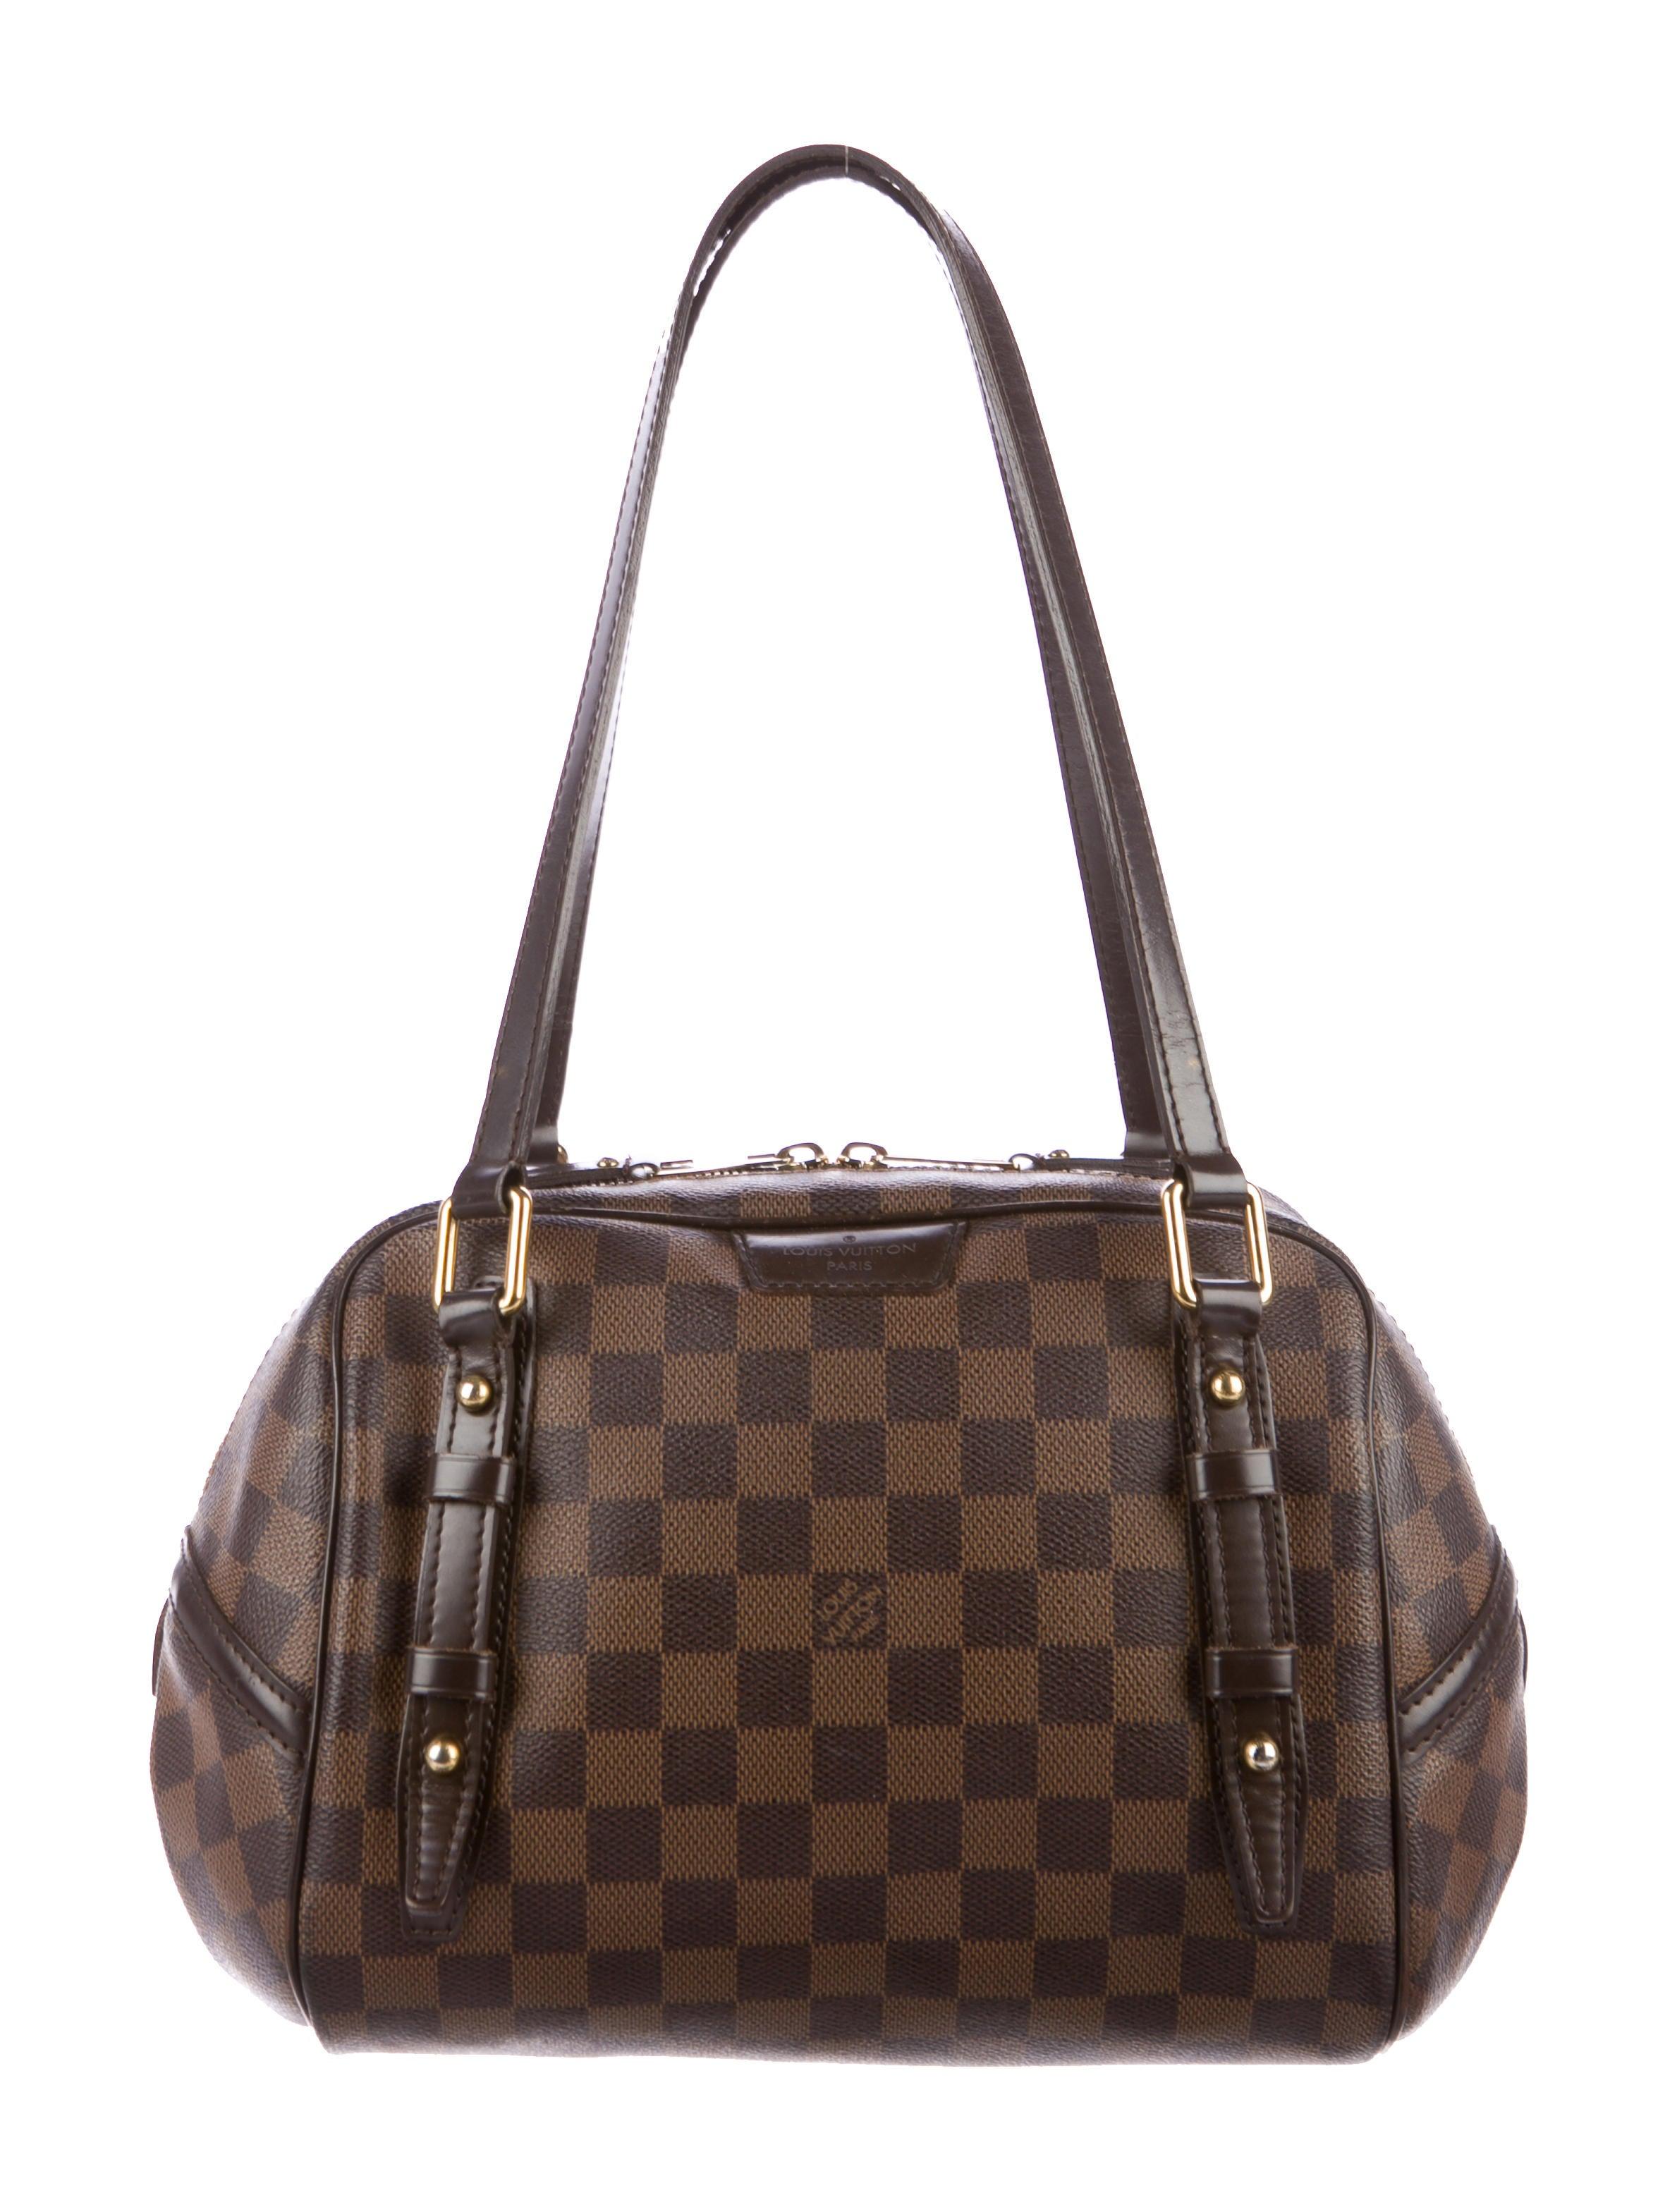 0b4b81c0b8f Louis Vuitton Damier Ebene Rivington PM - Handbags - LOU130863   The ...